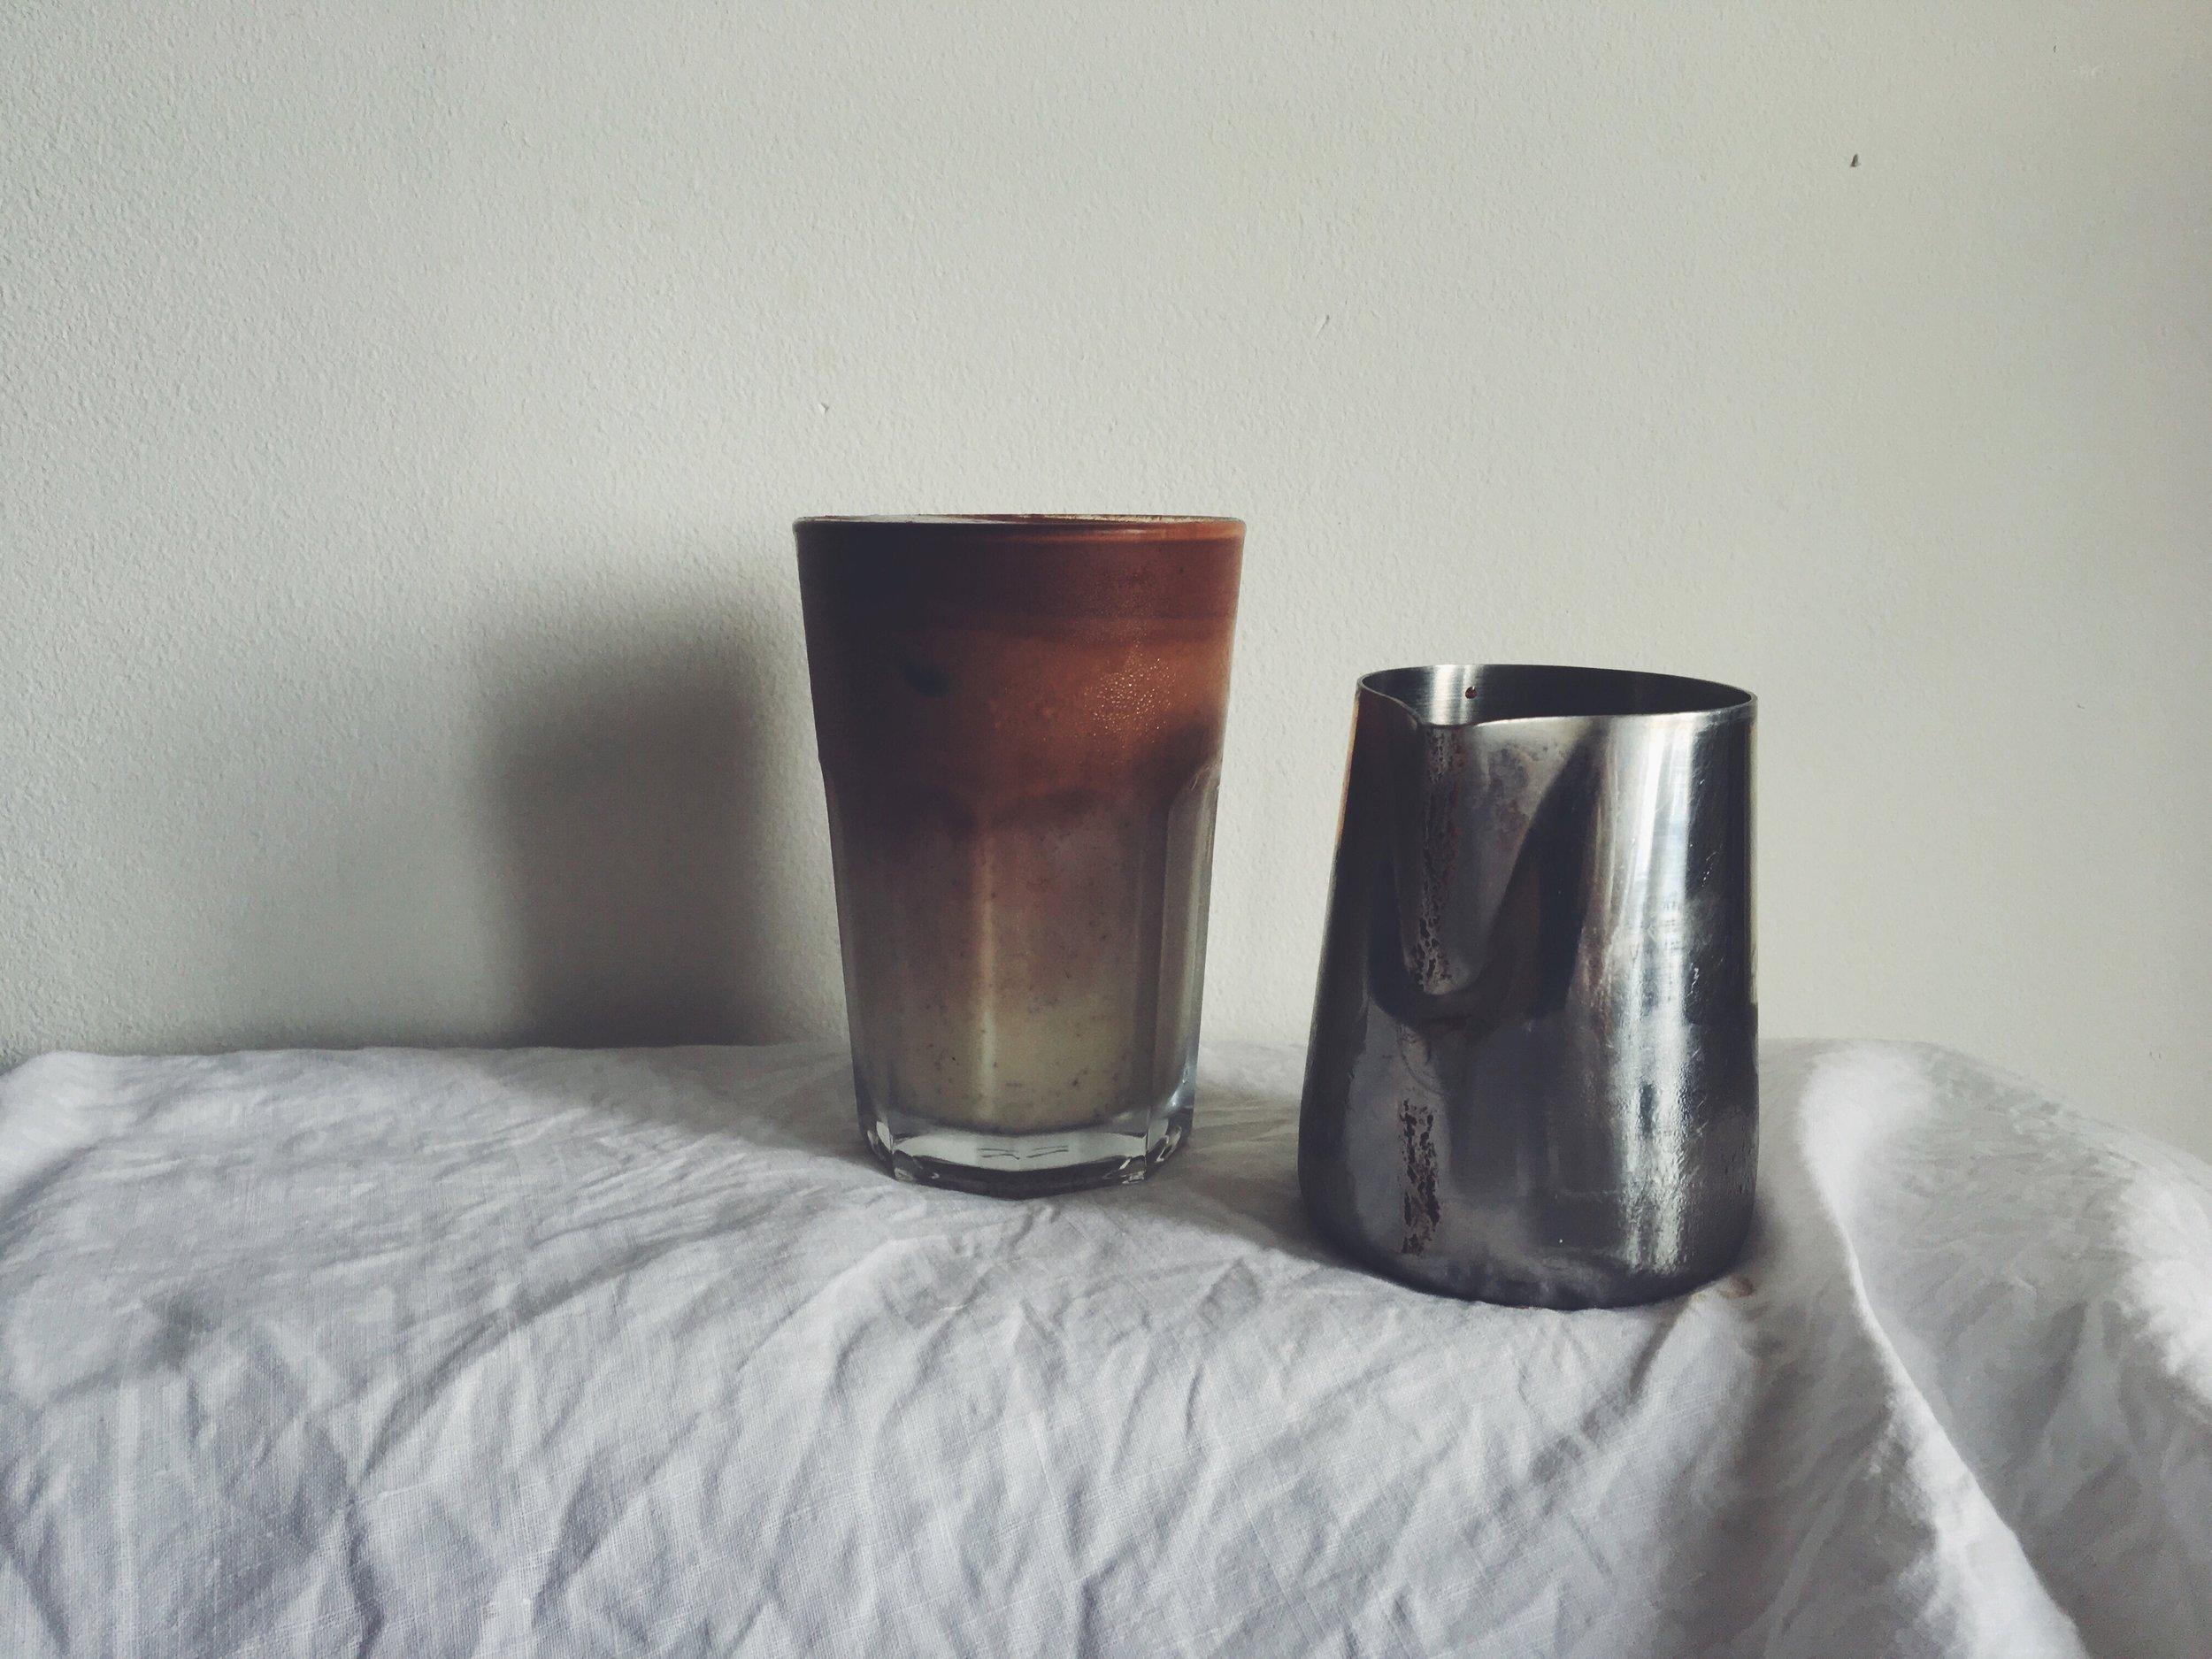 vegan iced chocolate milk